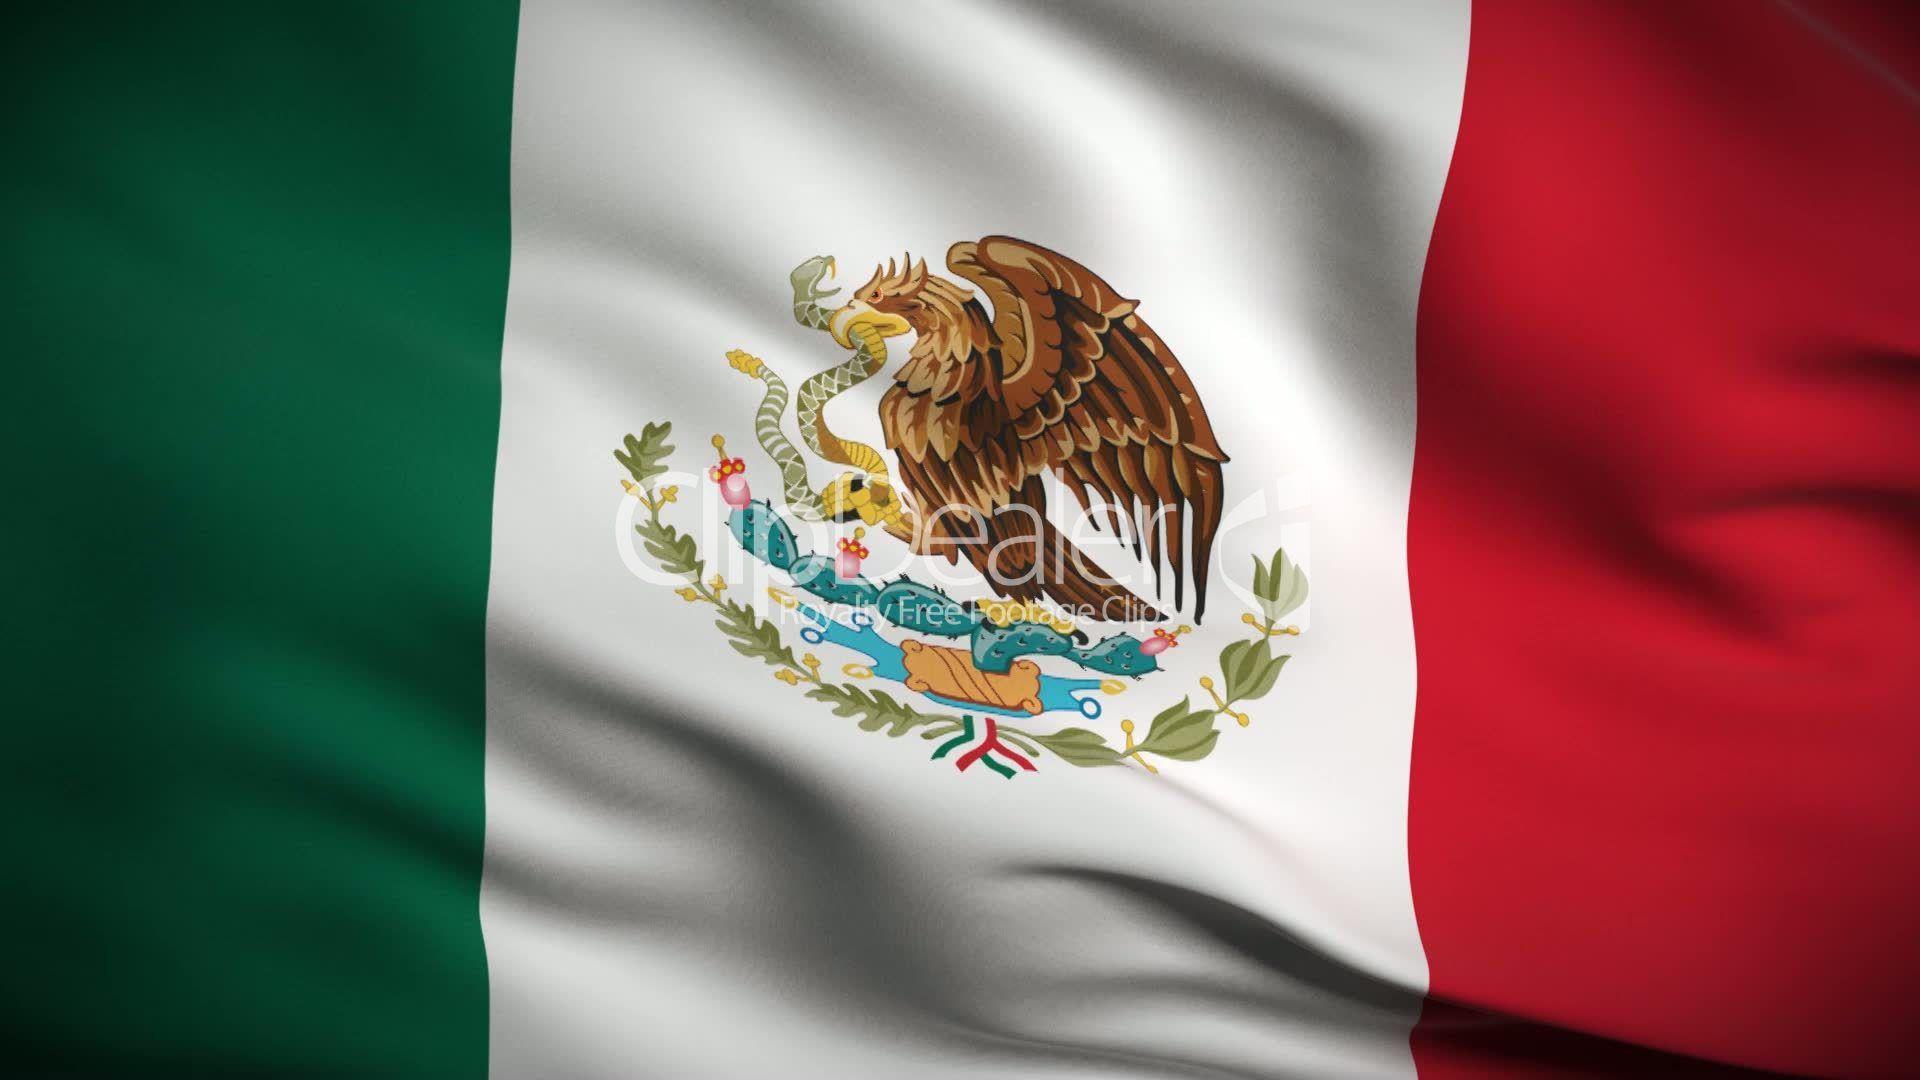 Mexican Flag Wallpaper HD Mexico wallpaper, Mexico flag